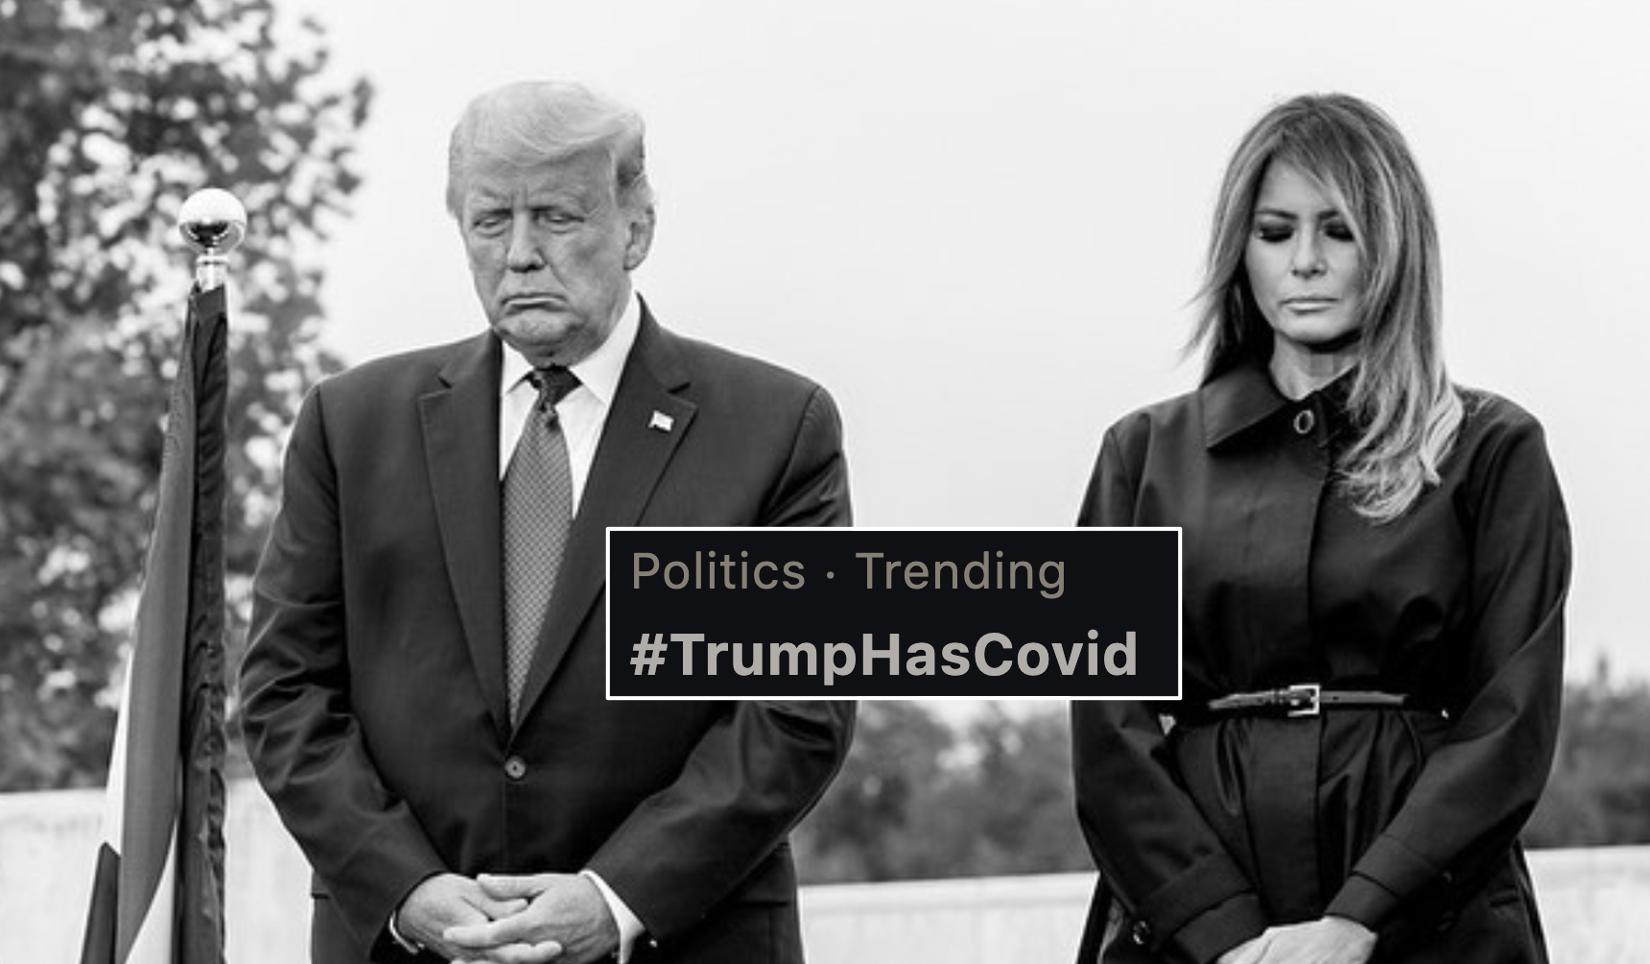 Trumphascovid Is The Number 1 Trending Hashtag On Twitter In Dubai Lovin Dubai